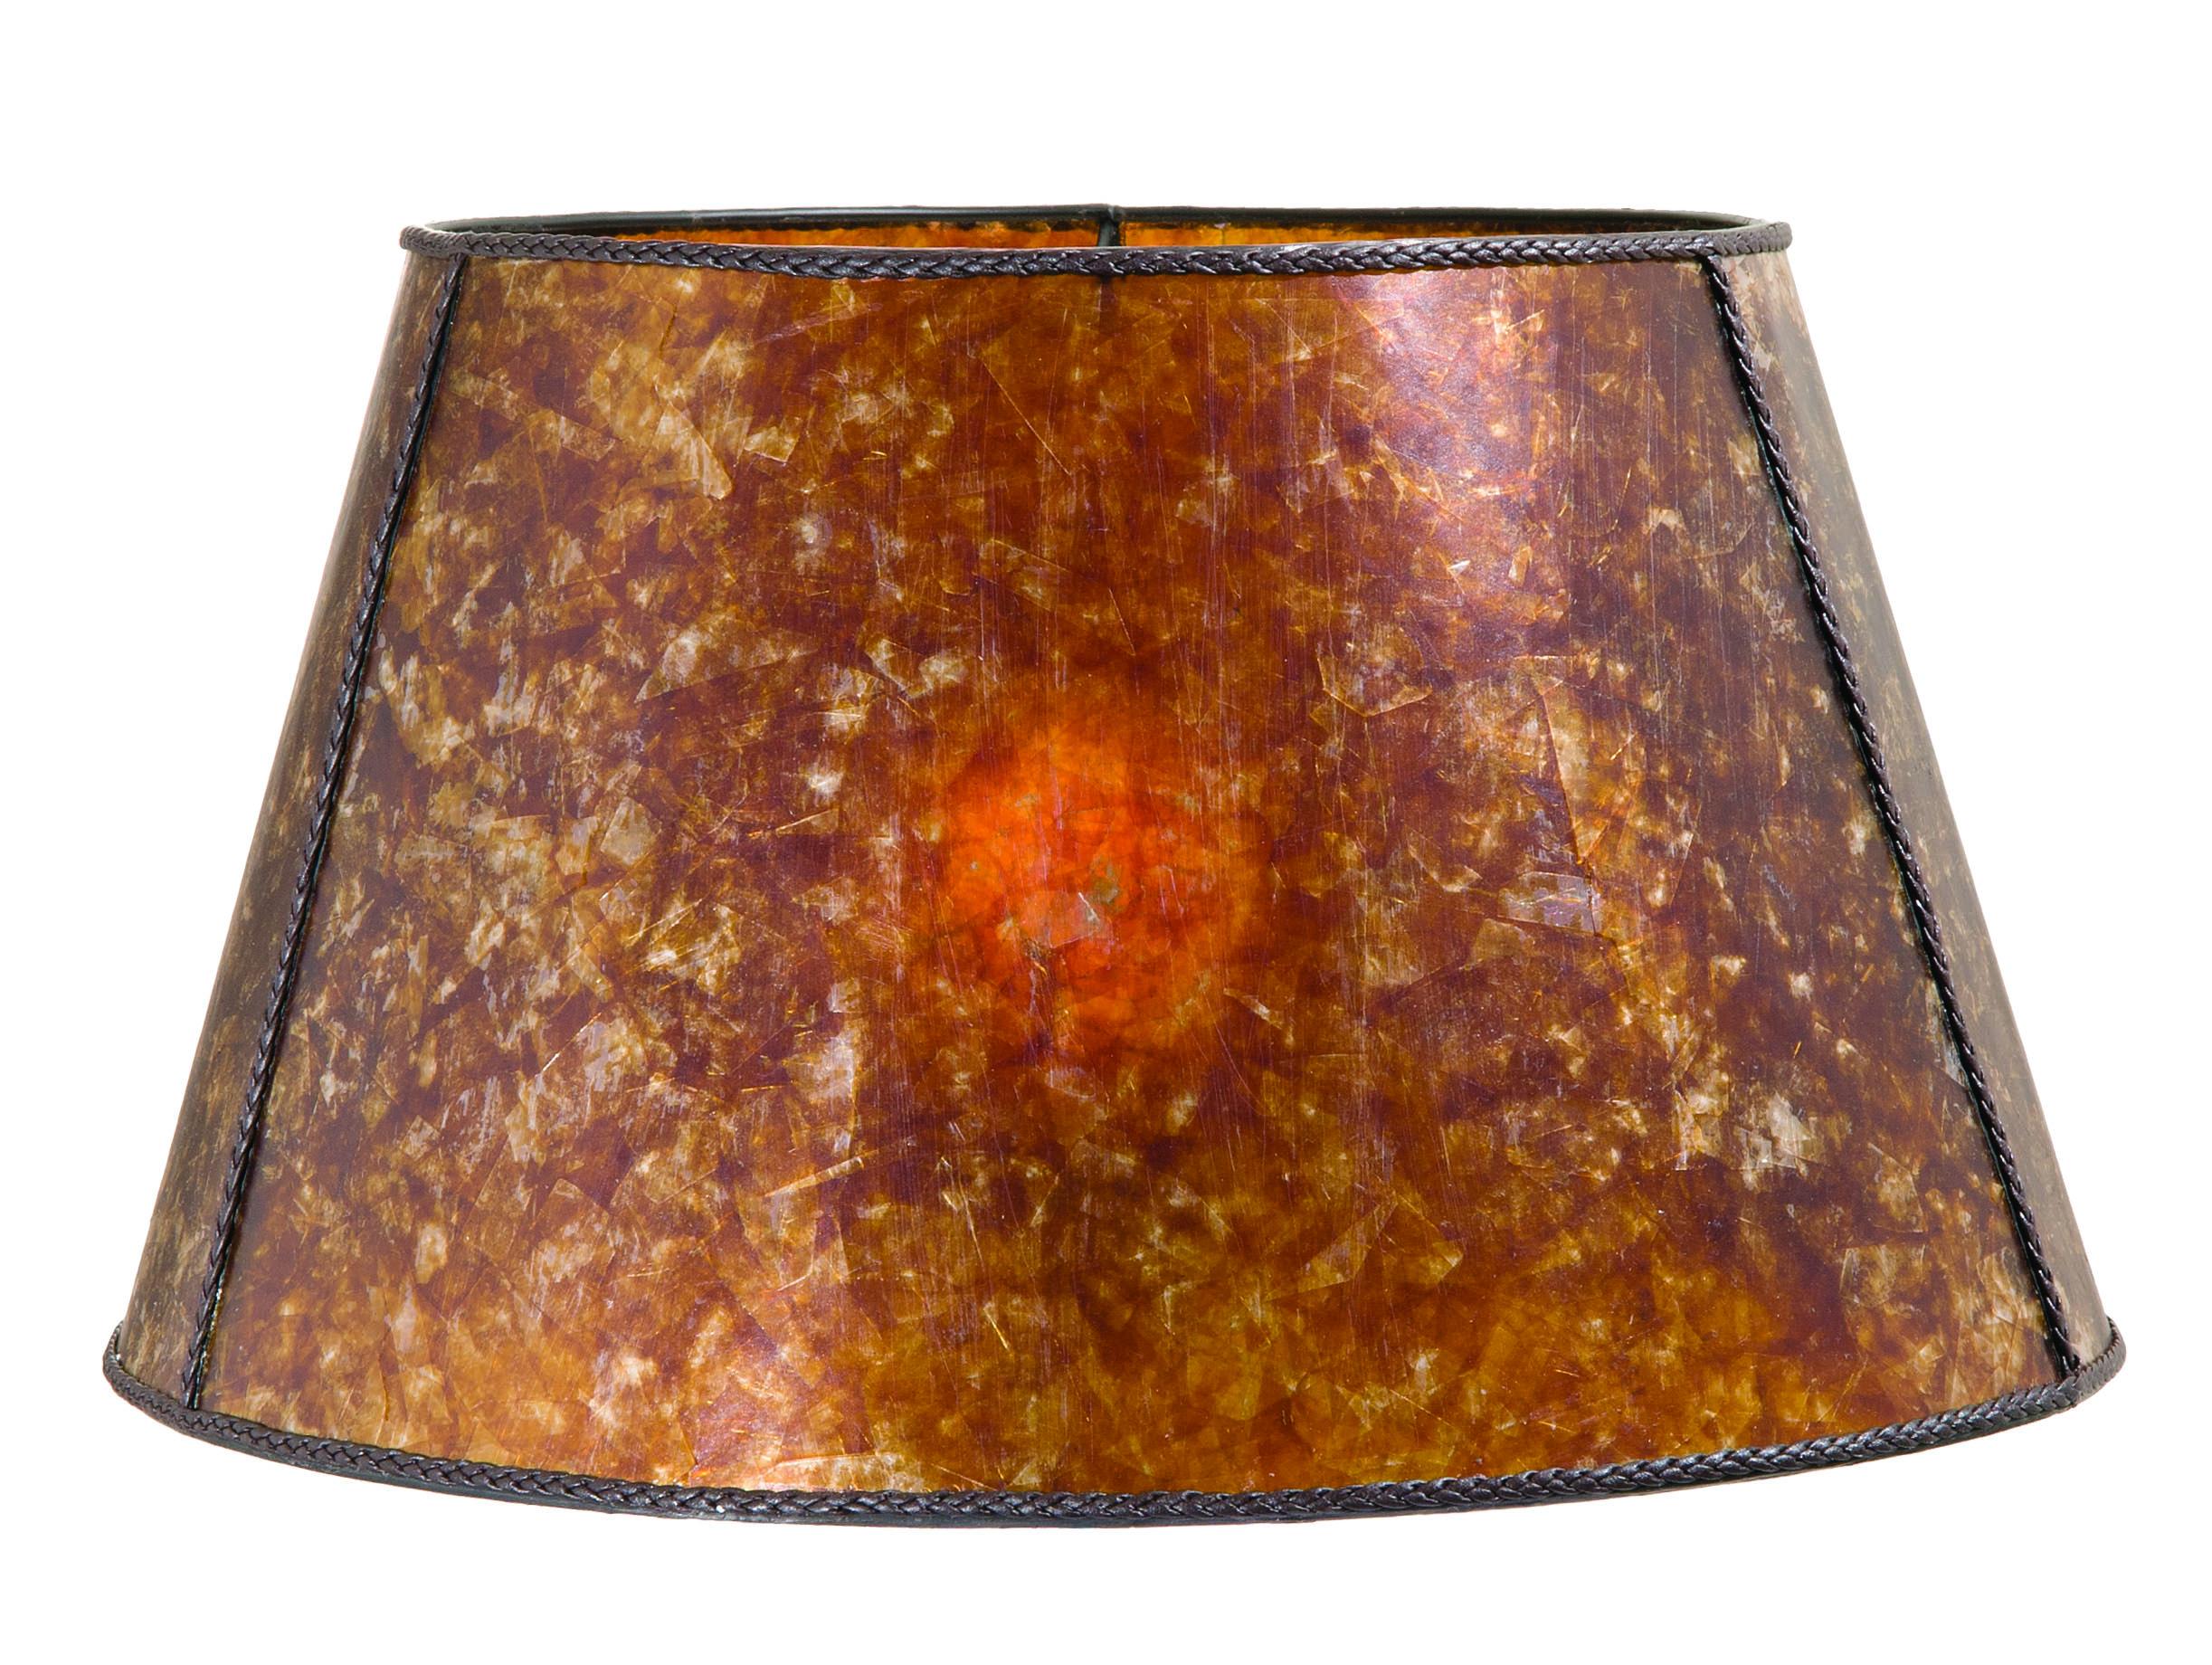 Amber Mica Empire Style Floor Lamp Shade 05719m B Amp P Lamp